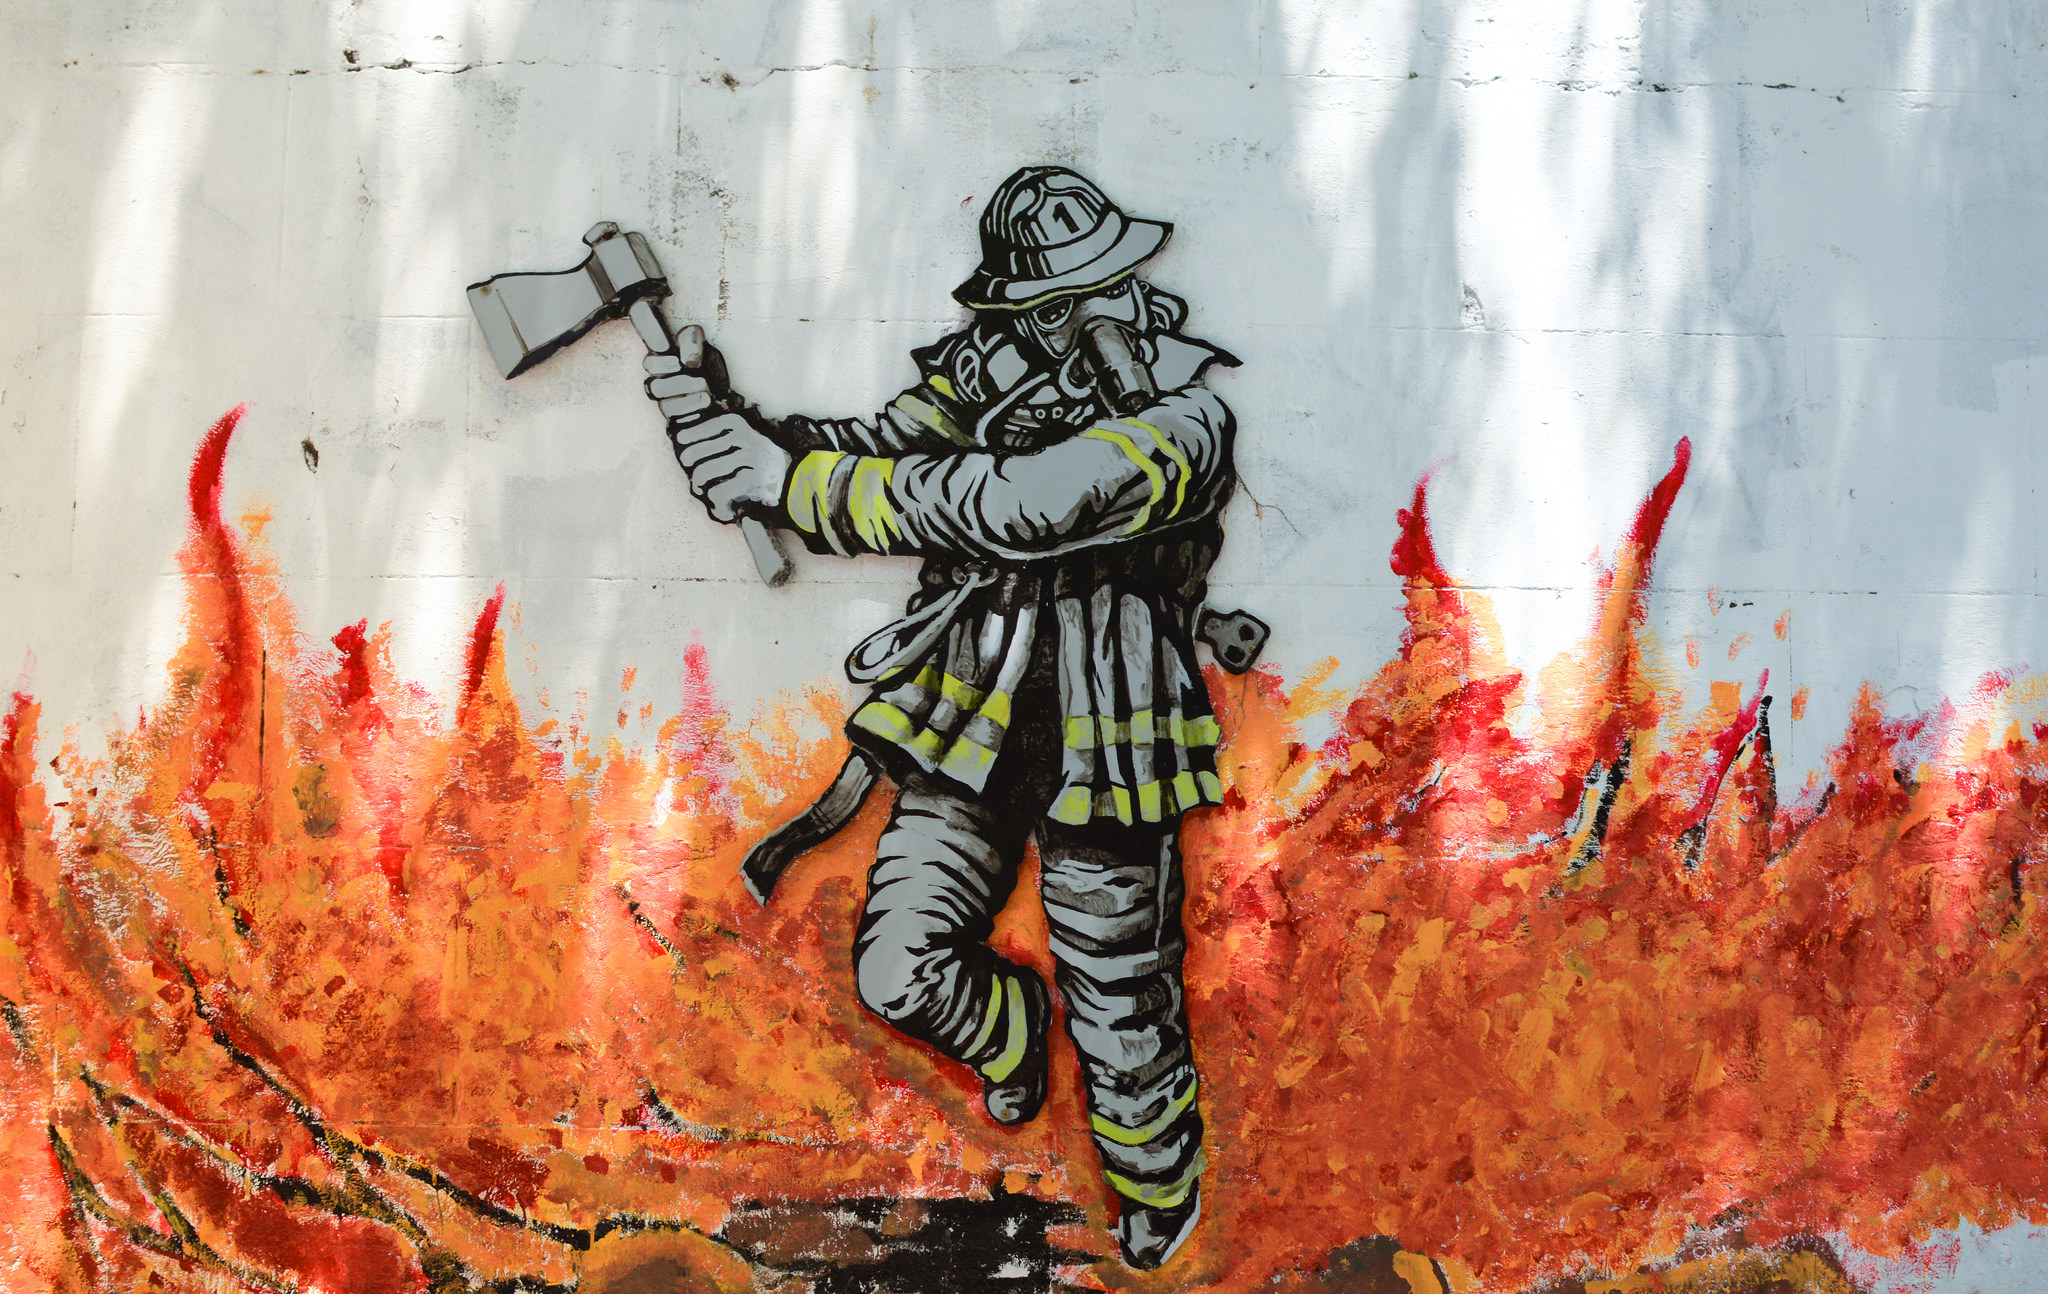 Fireman Graffiti - Boca, Argentina